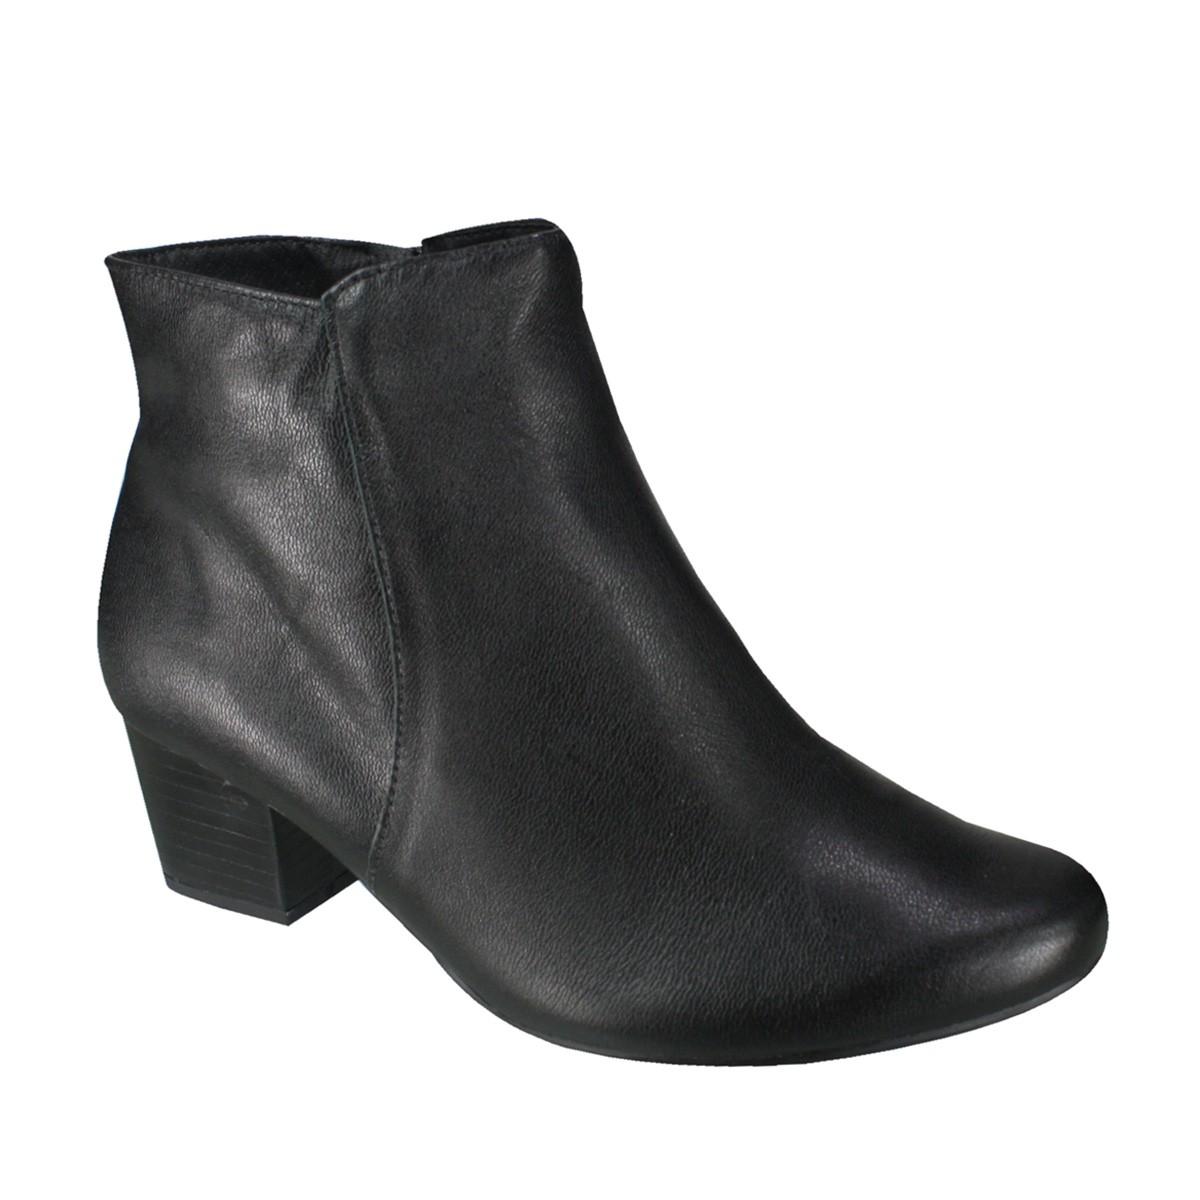 29dac1e4f5d Bota Usaflex Ankle Boot Q6621 41 Preto (Caprina)